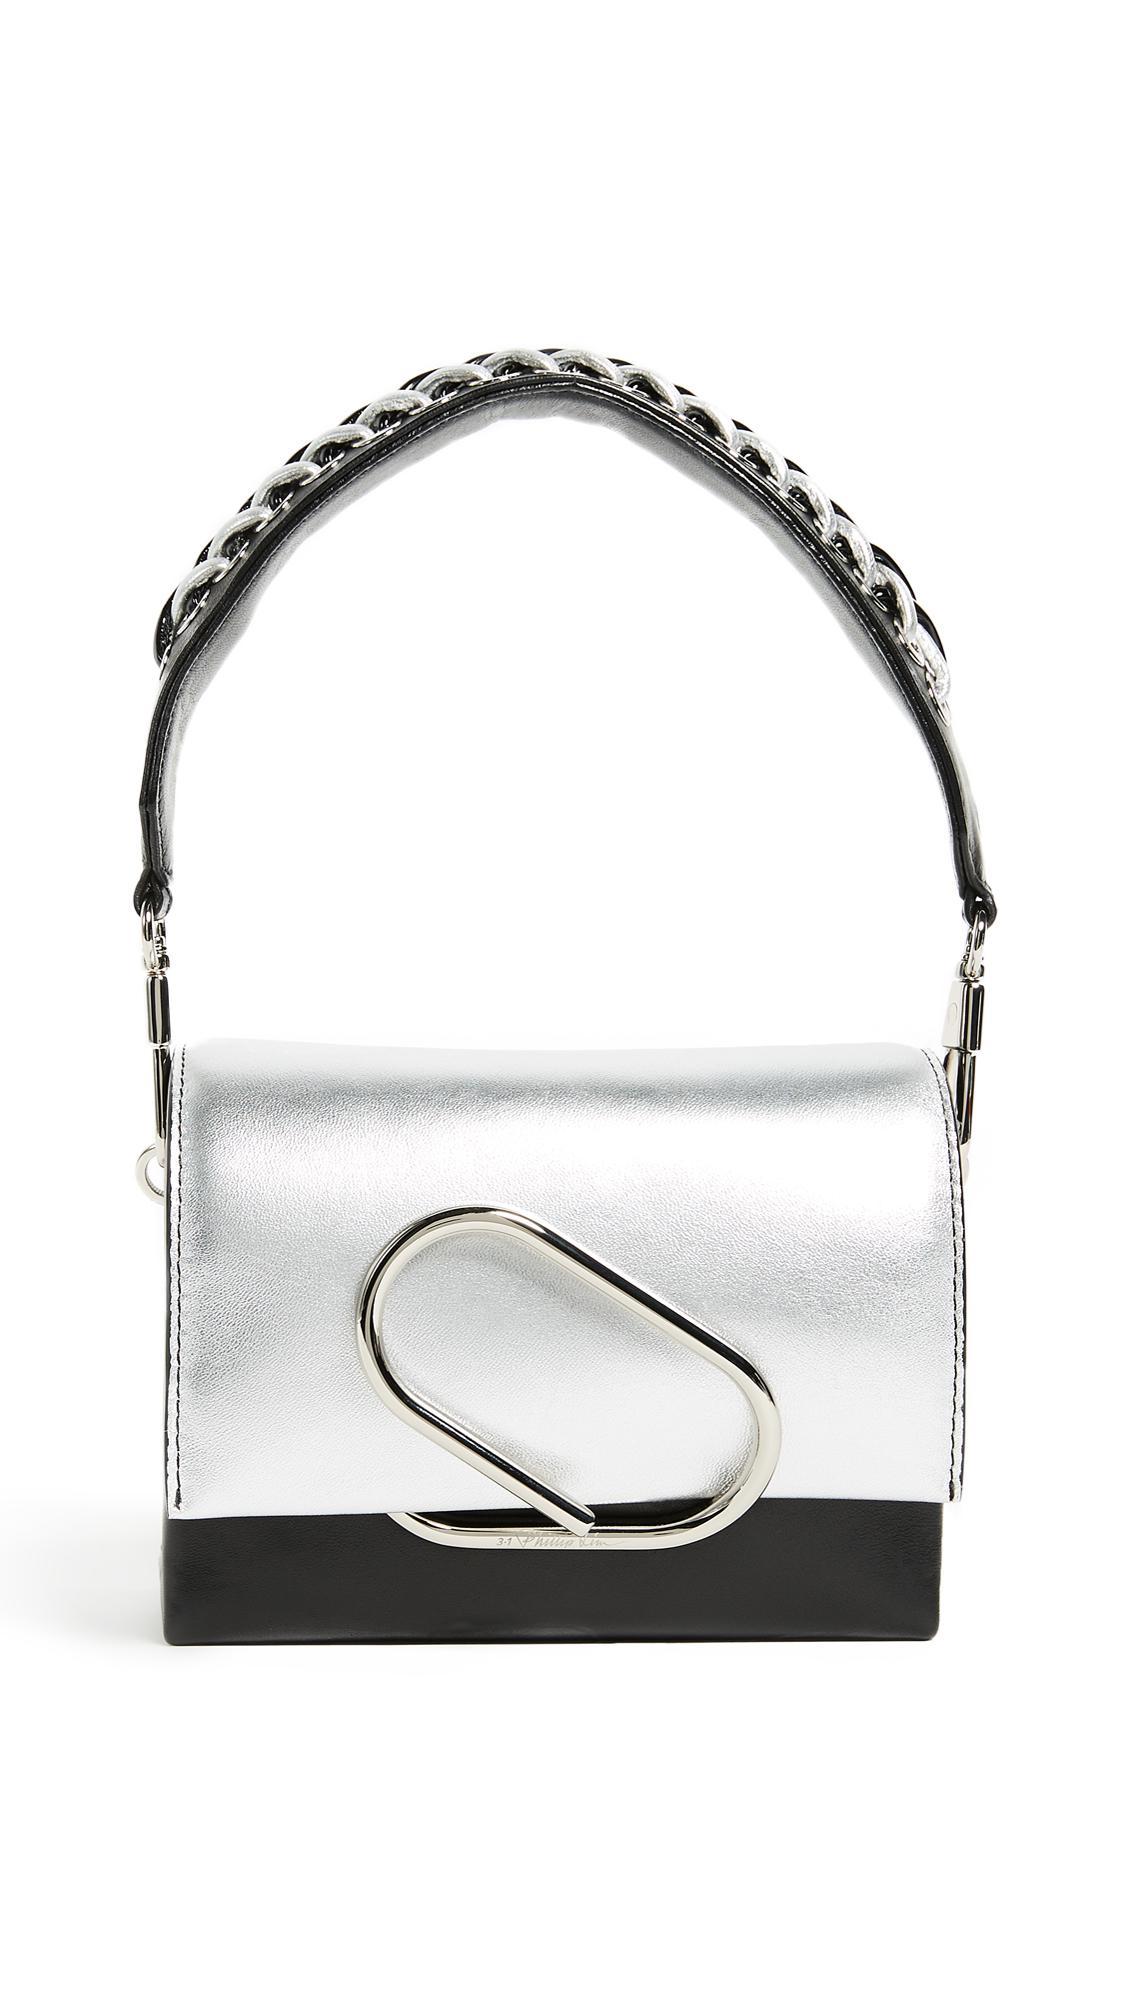 3.1 Phillip Lim Leather Alix Micro Sport Cross Body Bag in Silver/Black (Black)